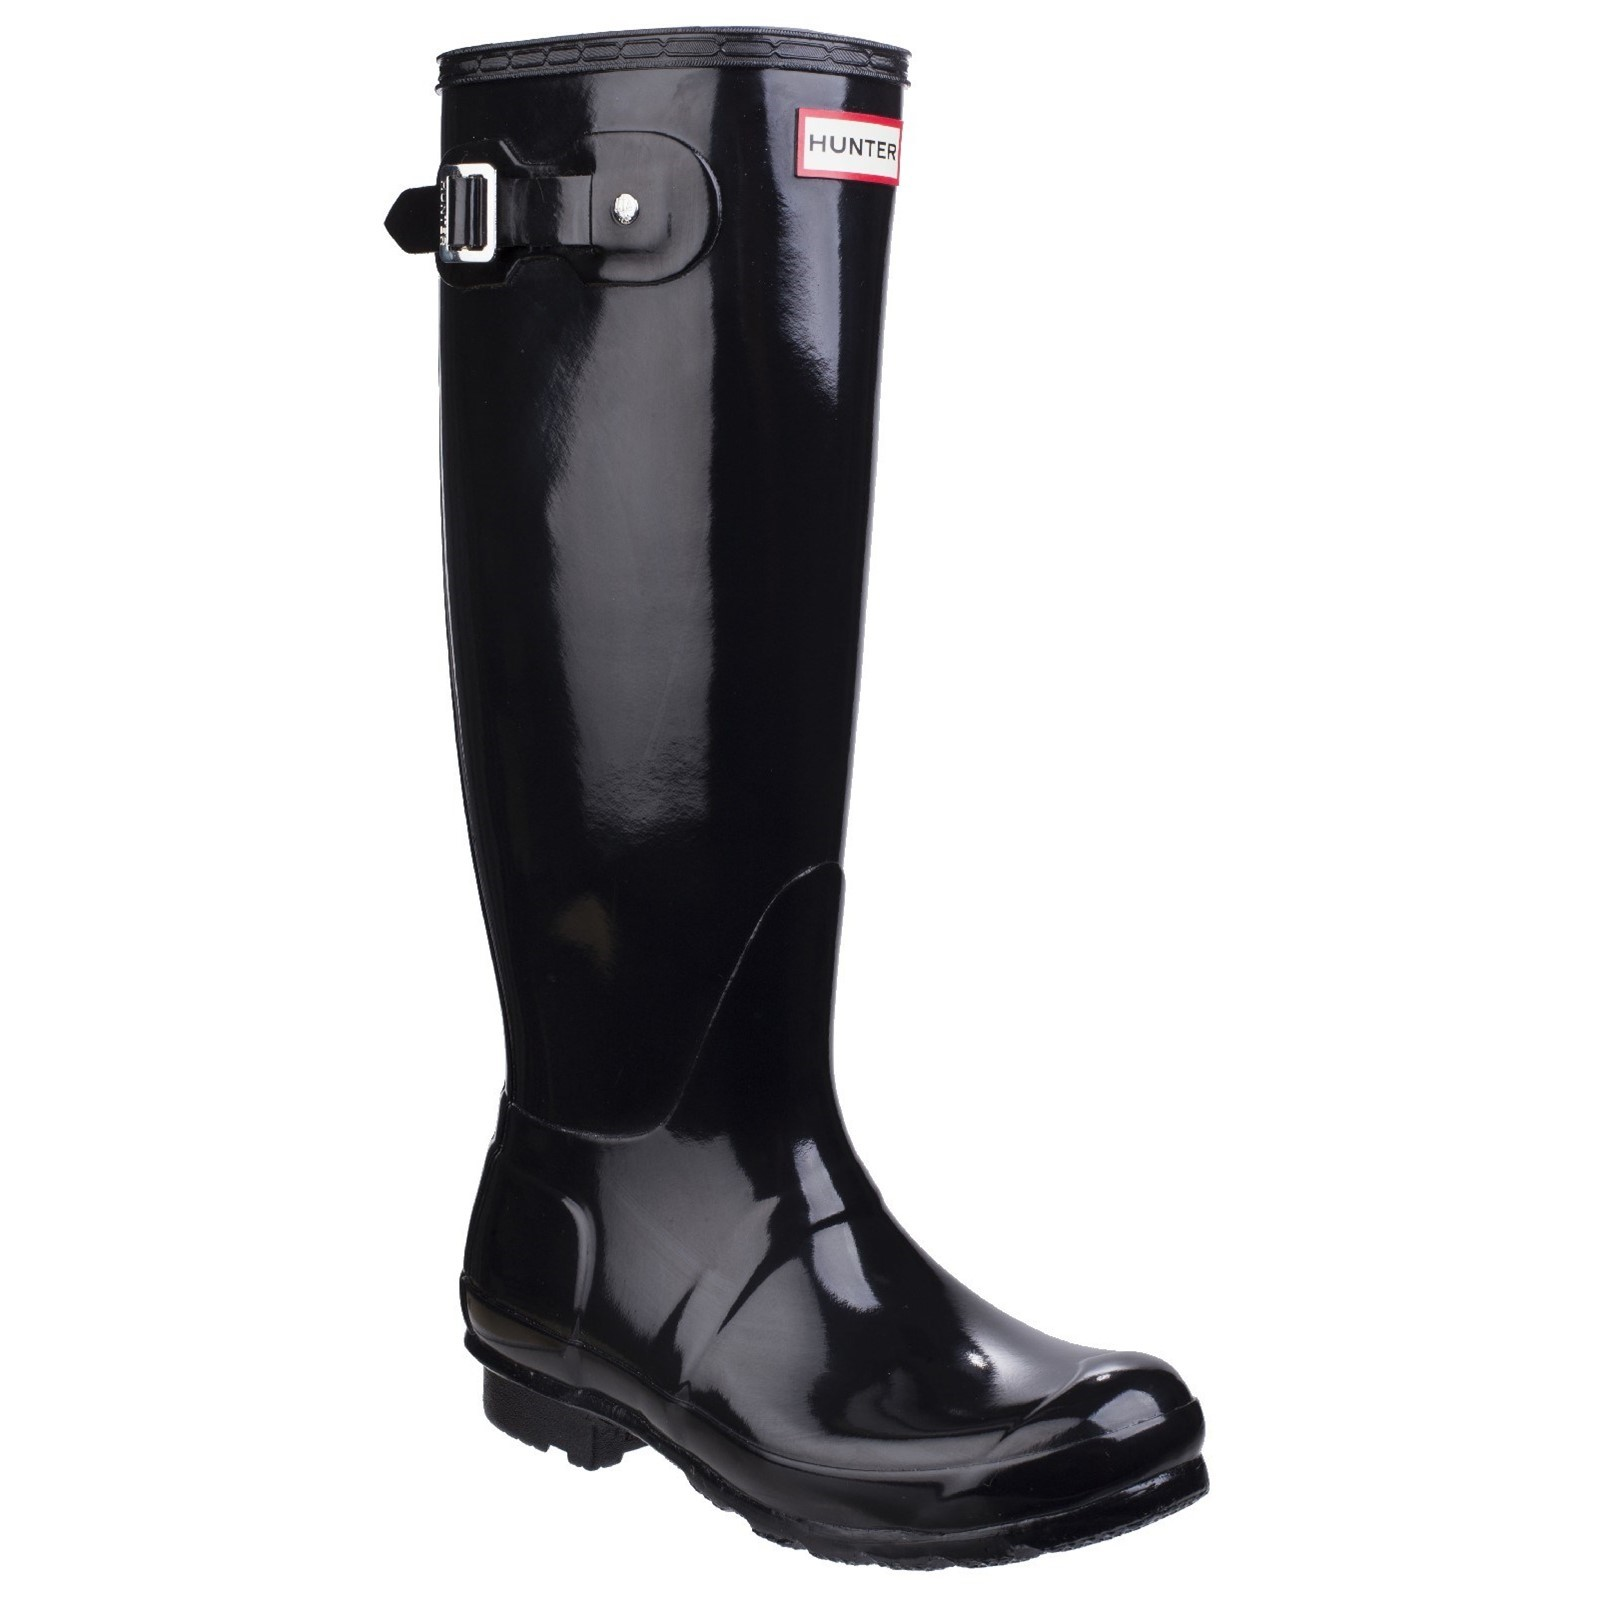 Womens Original Tall Gloss Wellington Boots Black